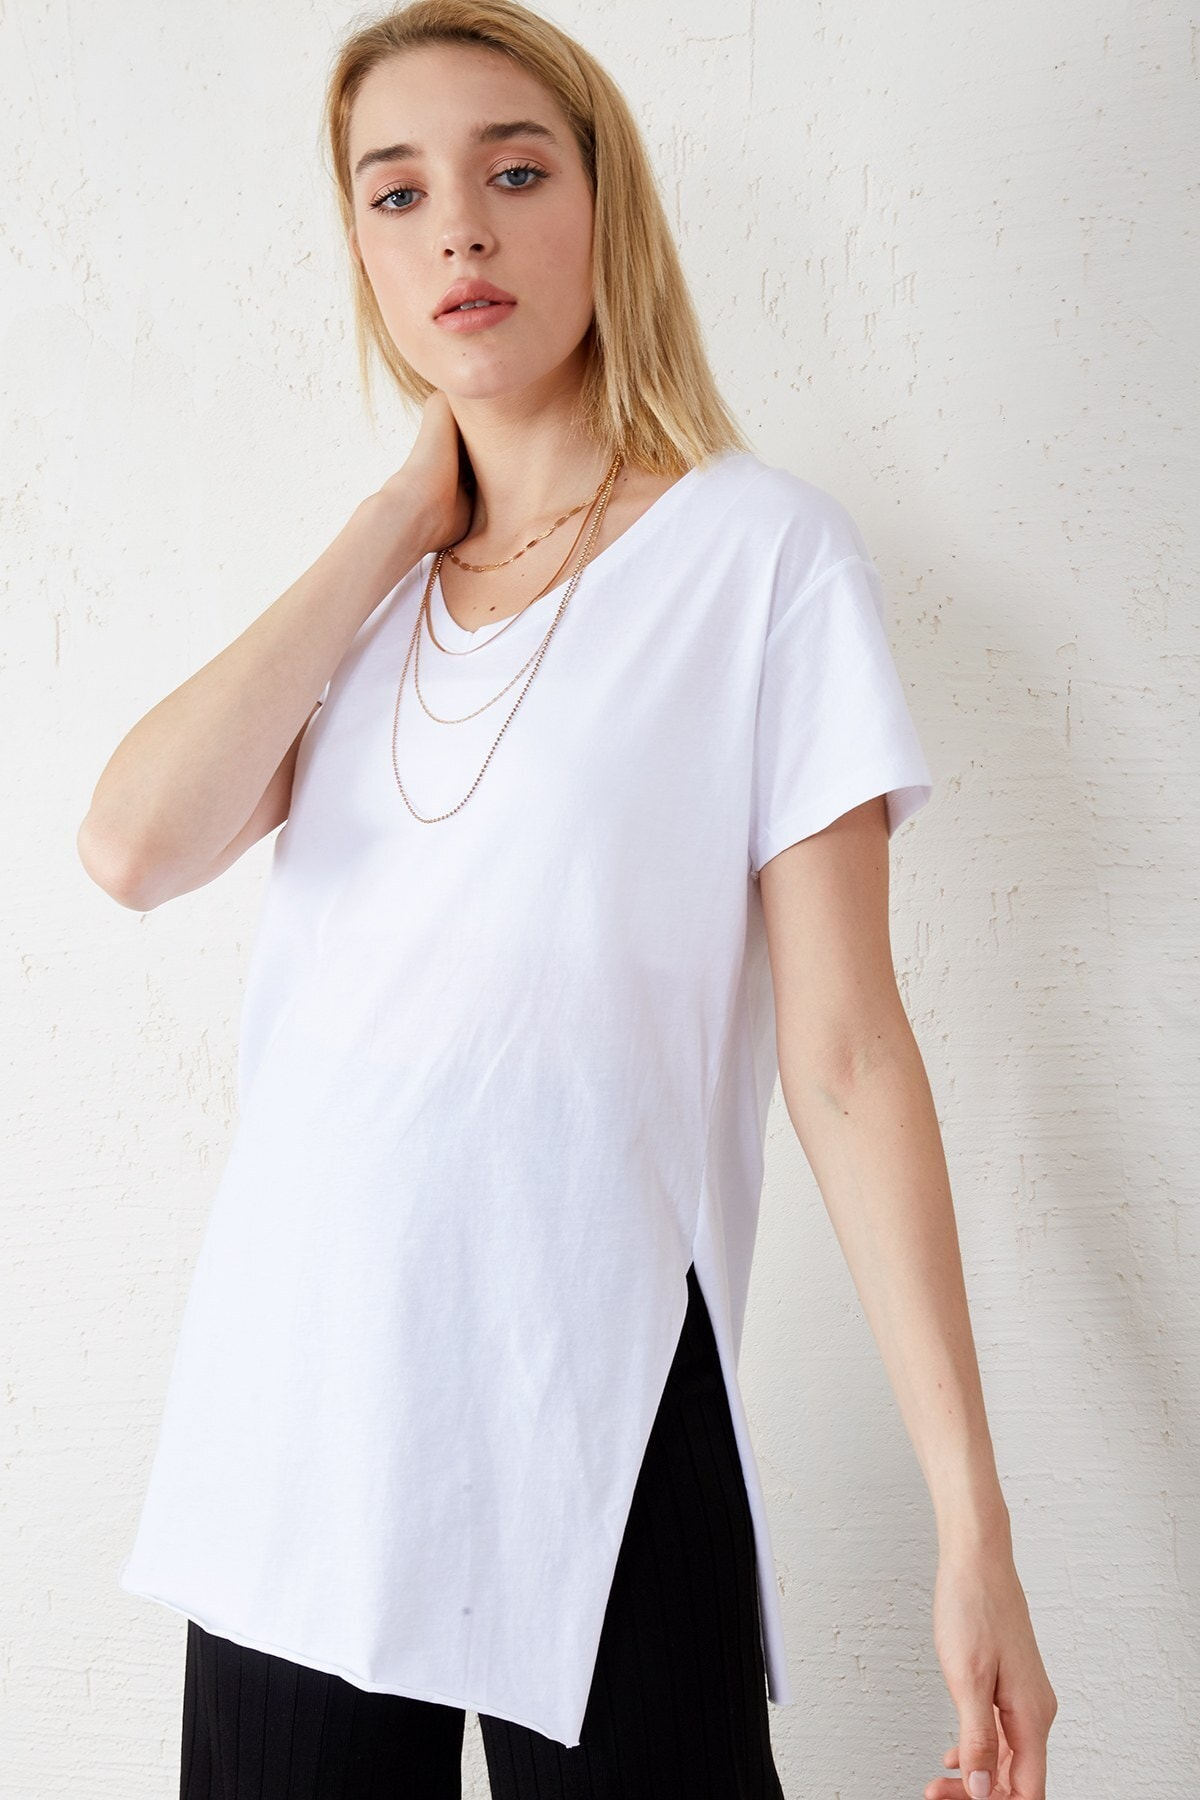 Eka Kadın Siyah - Beyaz 2'li Paket V Yaka Kısa Kol Yırtmaçlı T-shirt 2